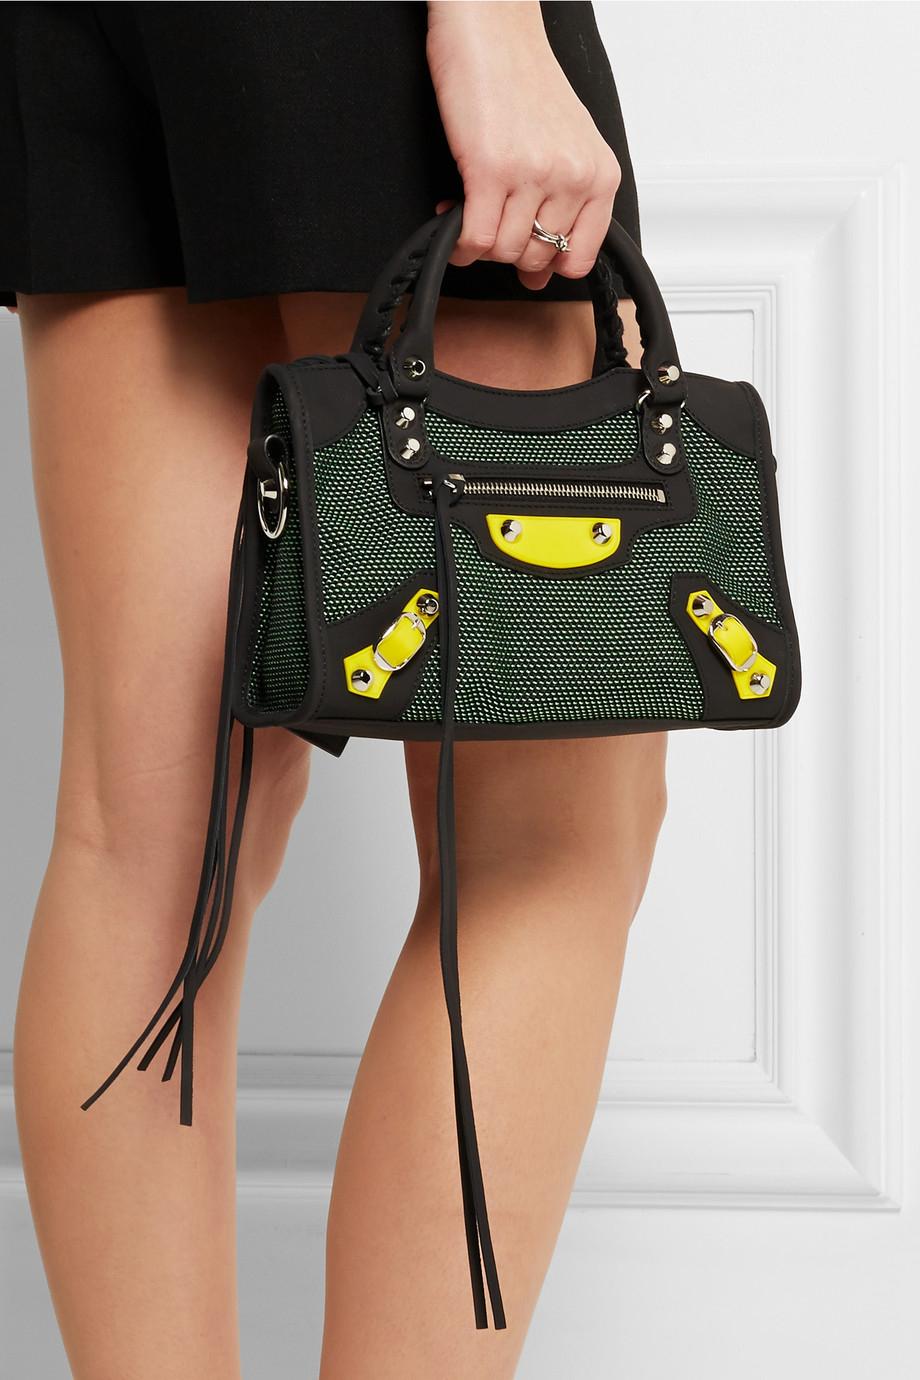 e12e39a9e0 Balenciaga City Mini Canvas And Neoprene Shoulder Bag in Green - Lyst